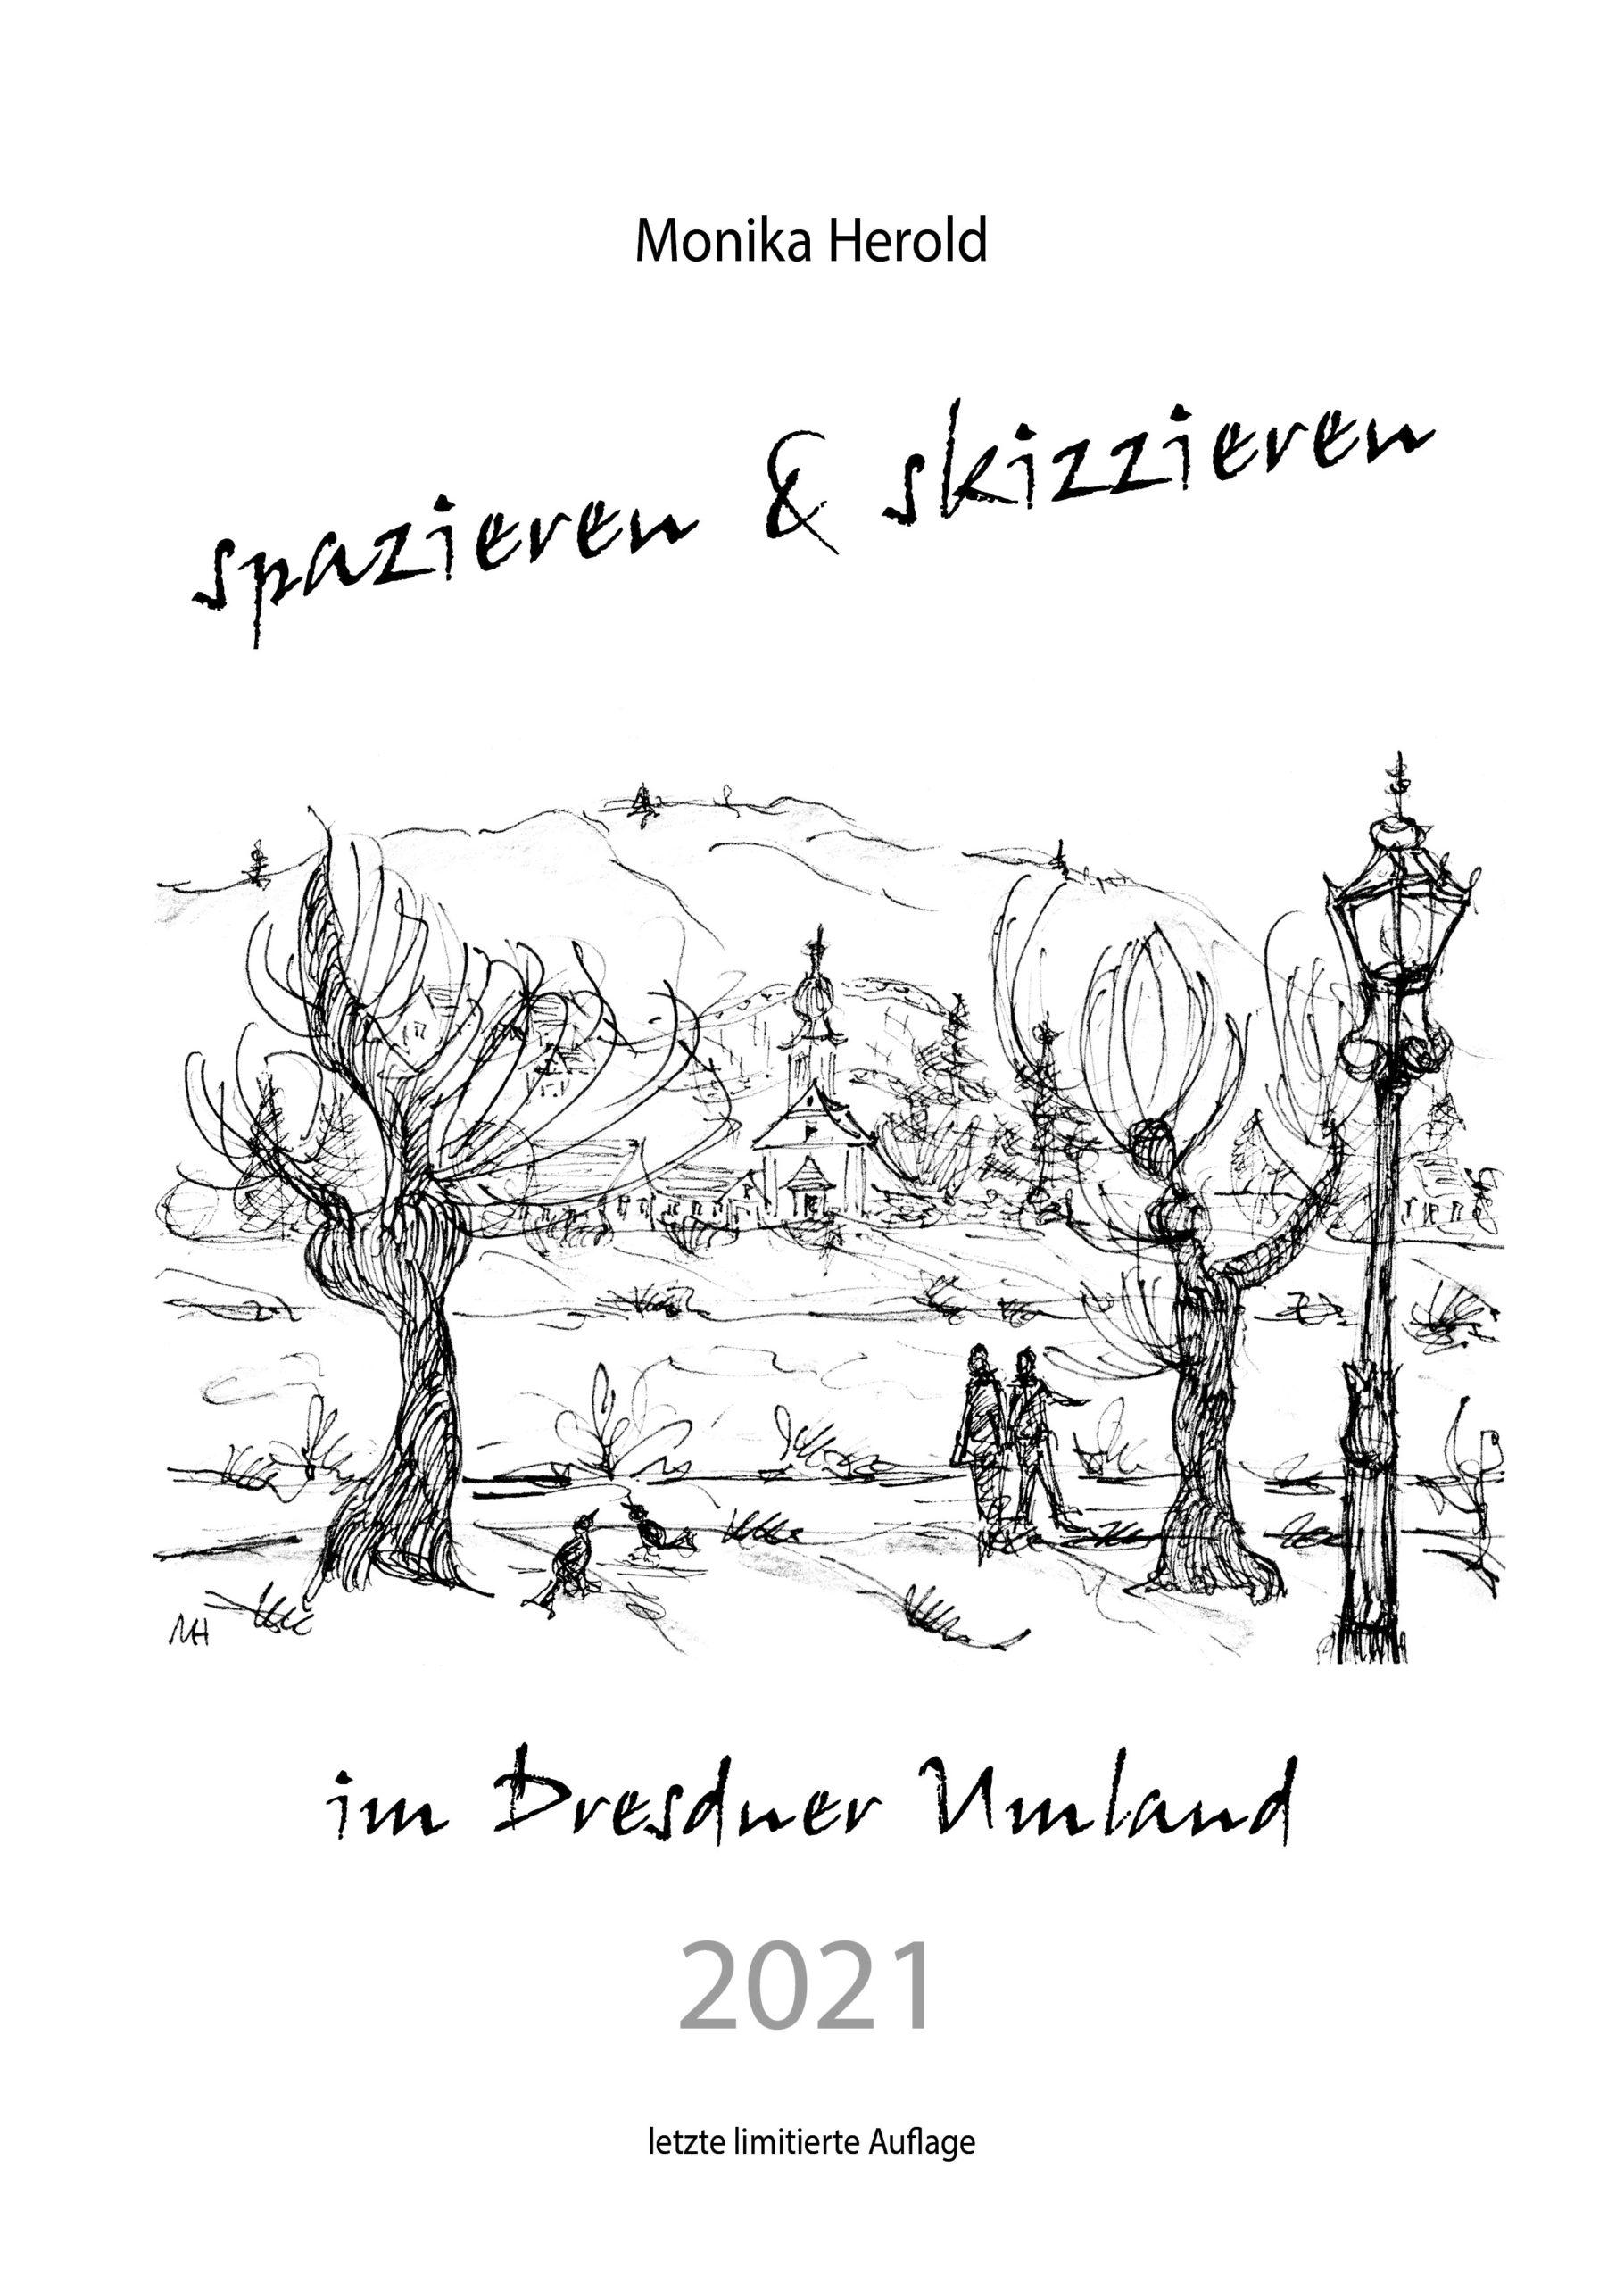 Skizzenkalender 2021, Dresdner Umland, Heidenau, Radbeul, Berggeißhübel, Natur, Sachsen